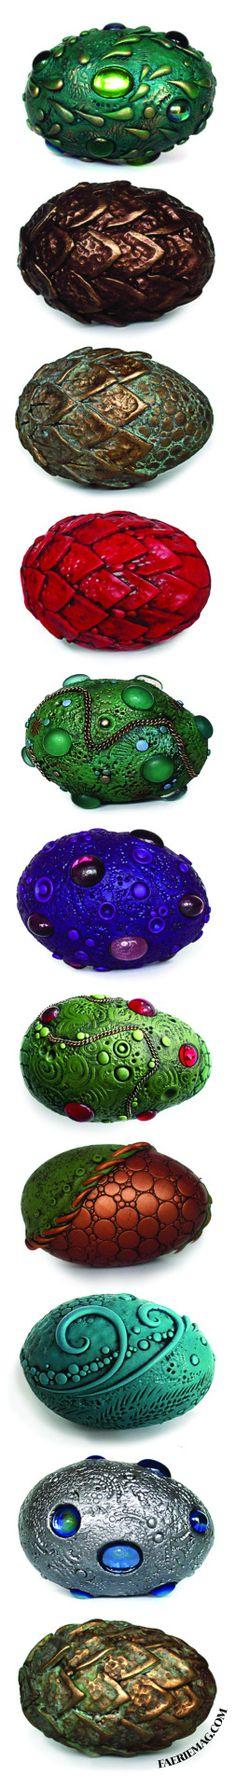 Dragon eggs!Available...   Faerie Magazine   Bloglovin'